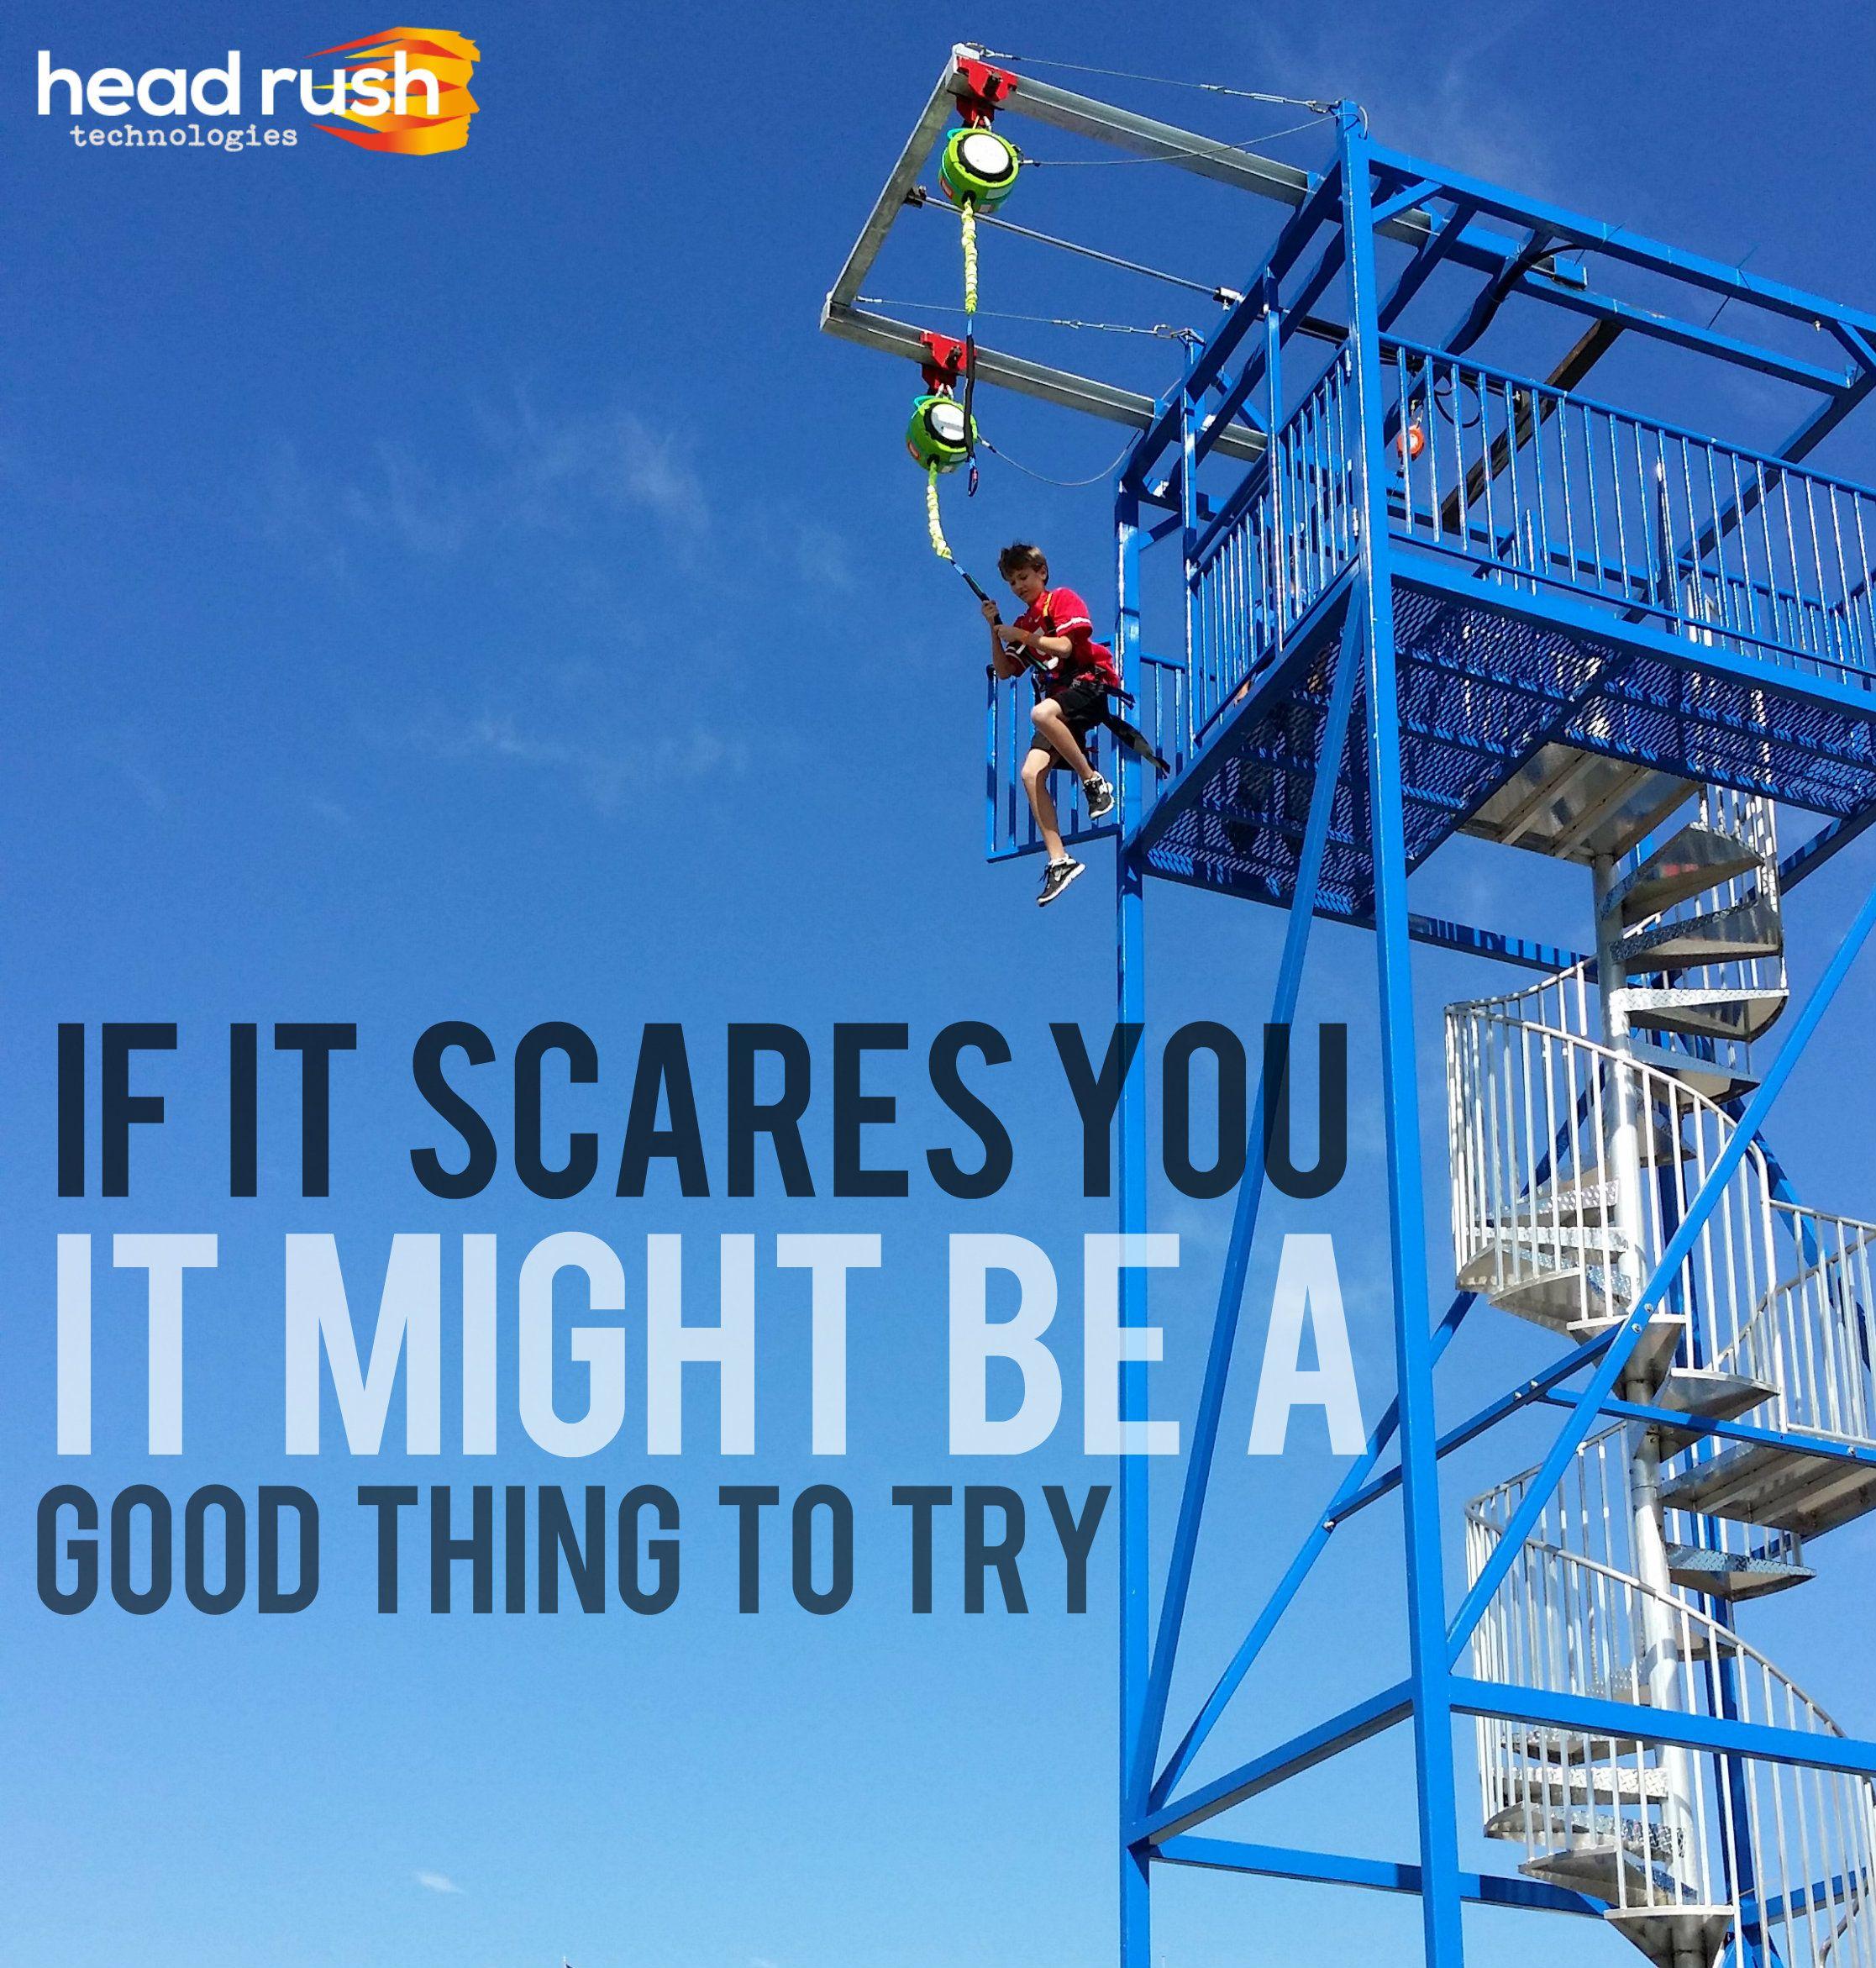 Quickjump Free Fall Device Freefall Adventure Quotes Ziplining Adventure